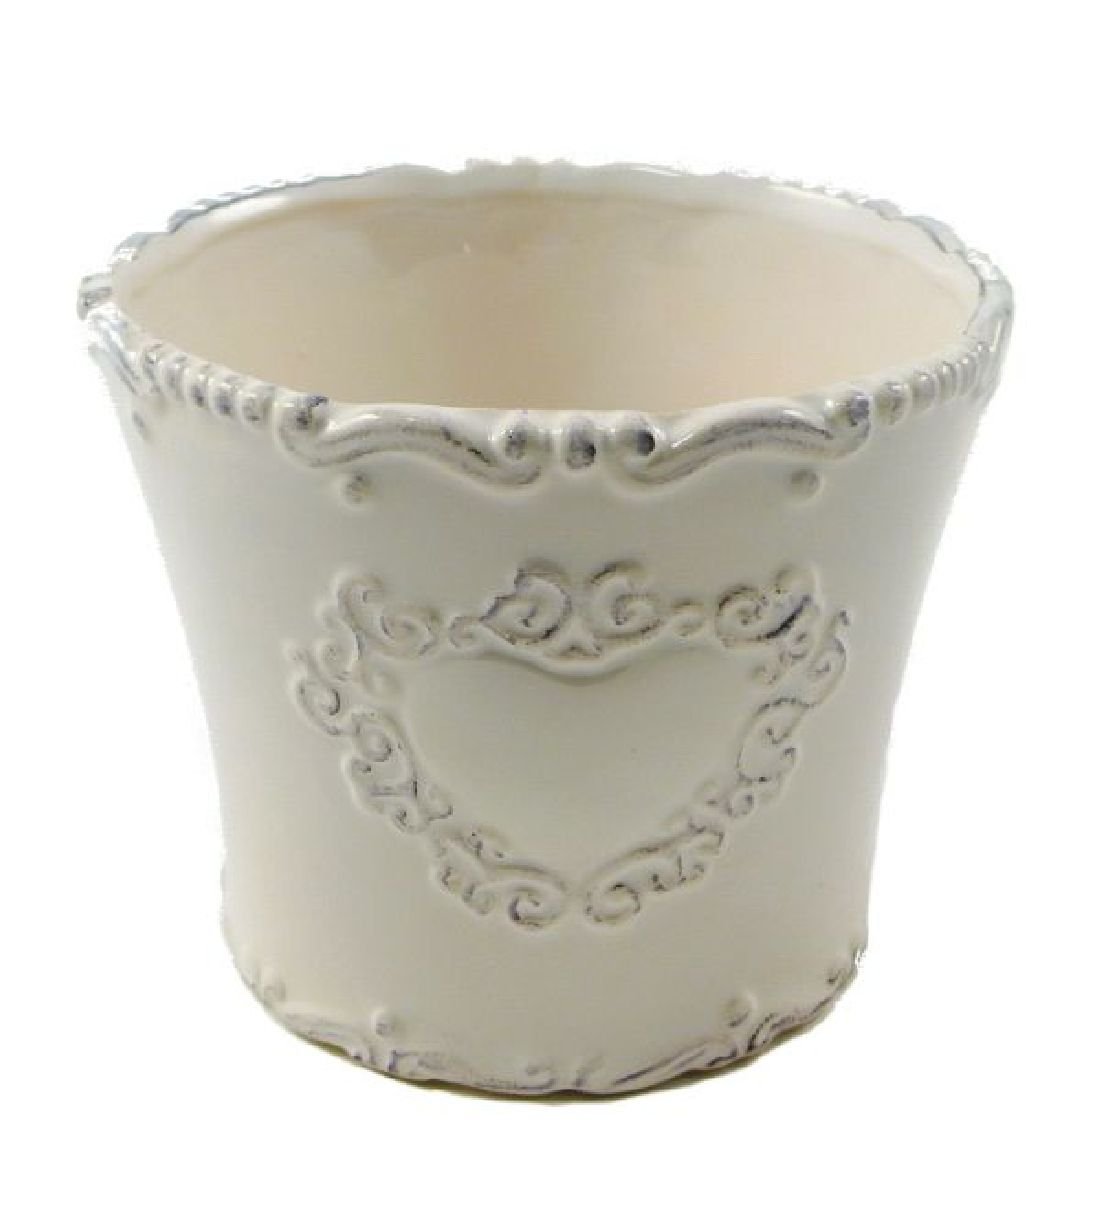 Keramik Topf Sweetheart CREME-GLASIERT rund 13,5x11cm 44321